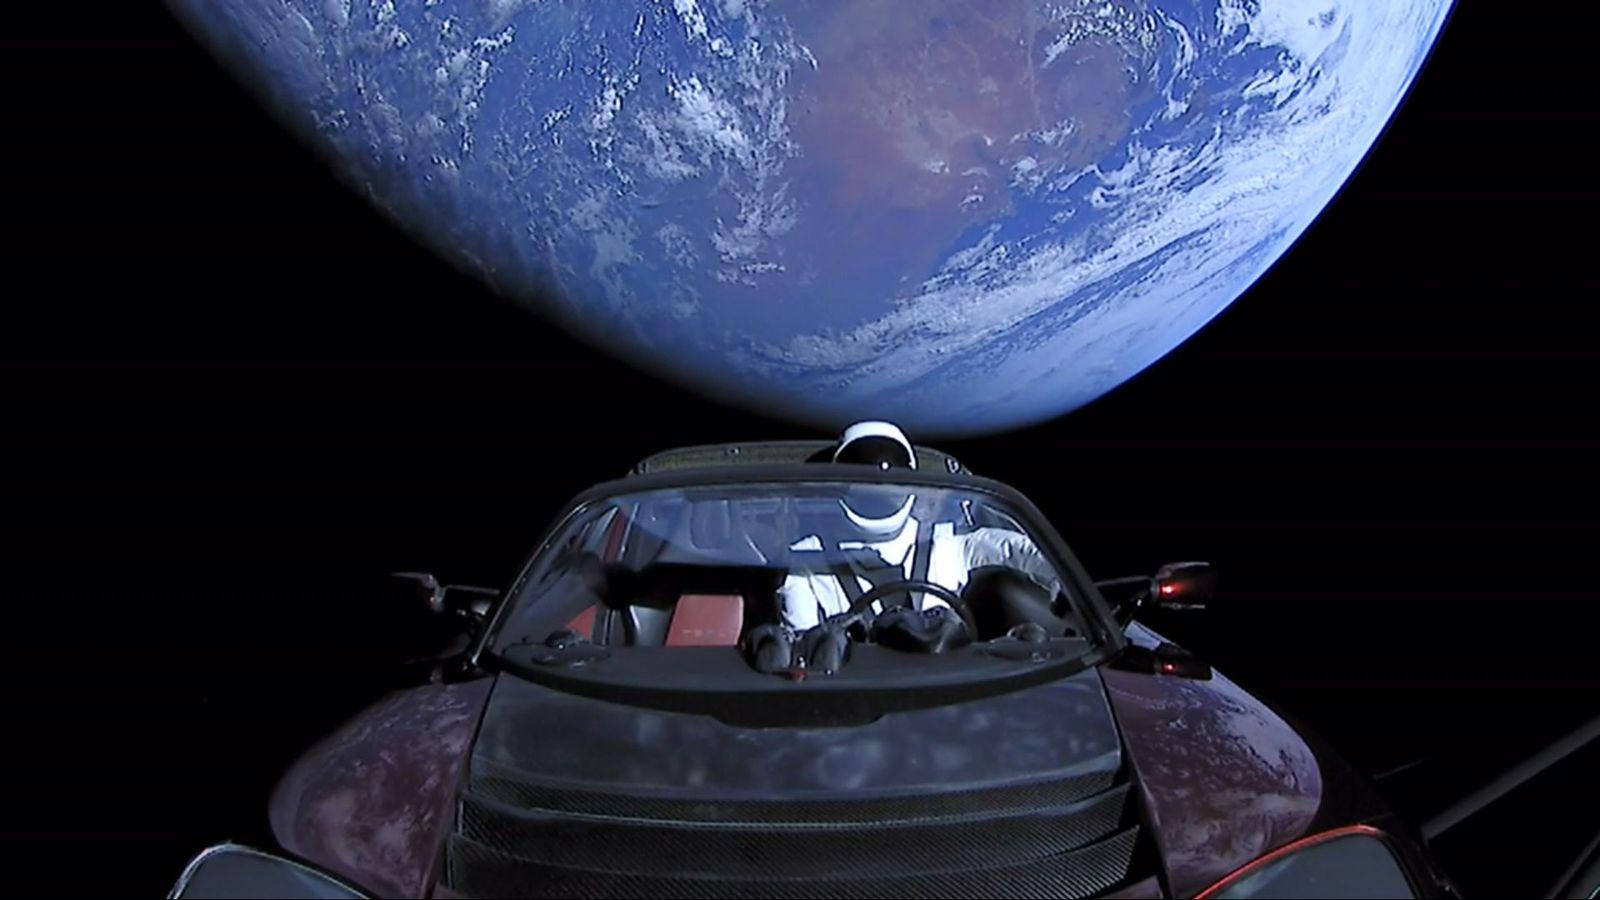 SpaceX/ Tesla Roadster/ Elon Musk